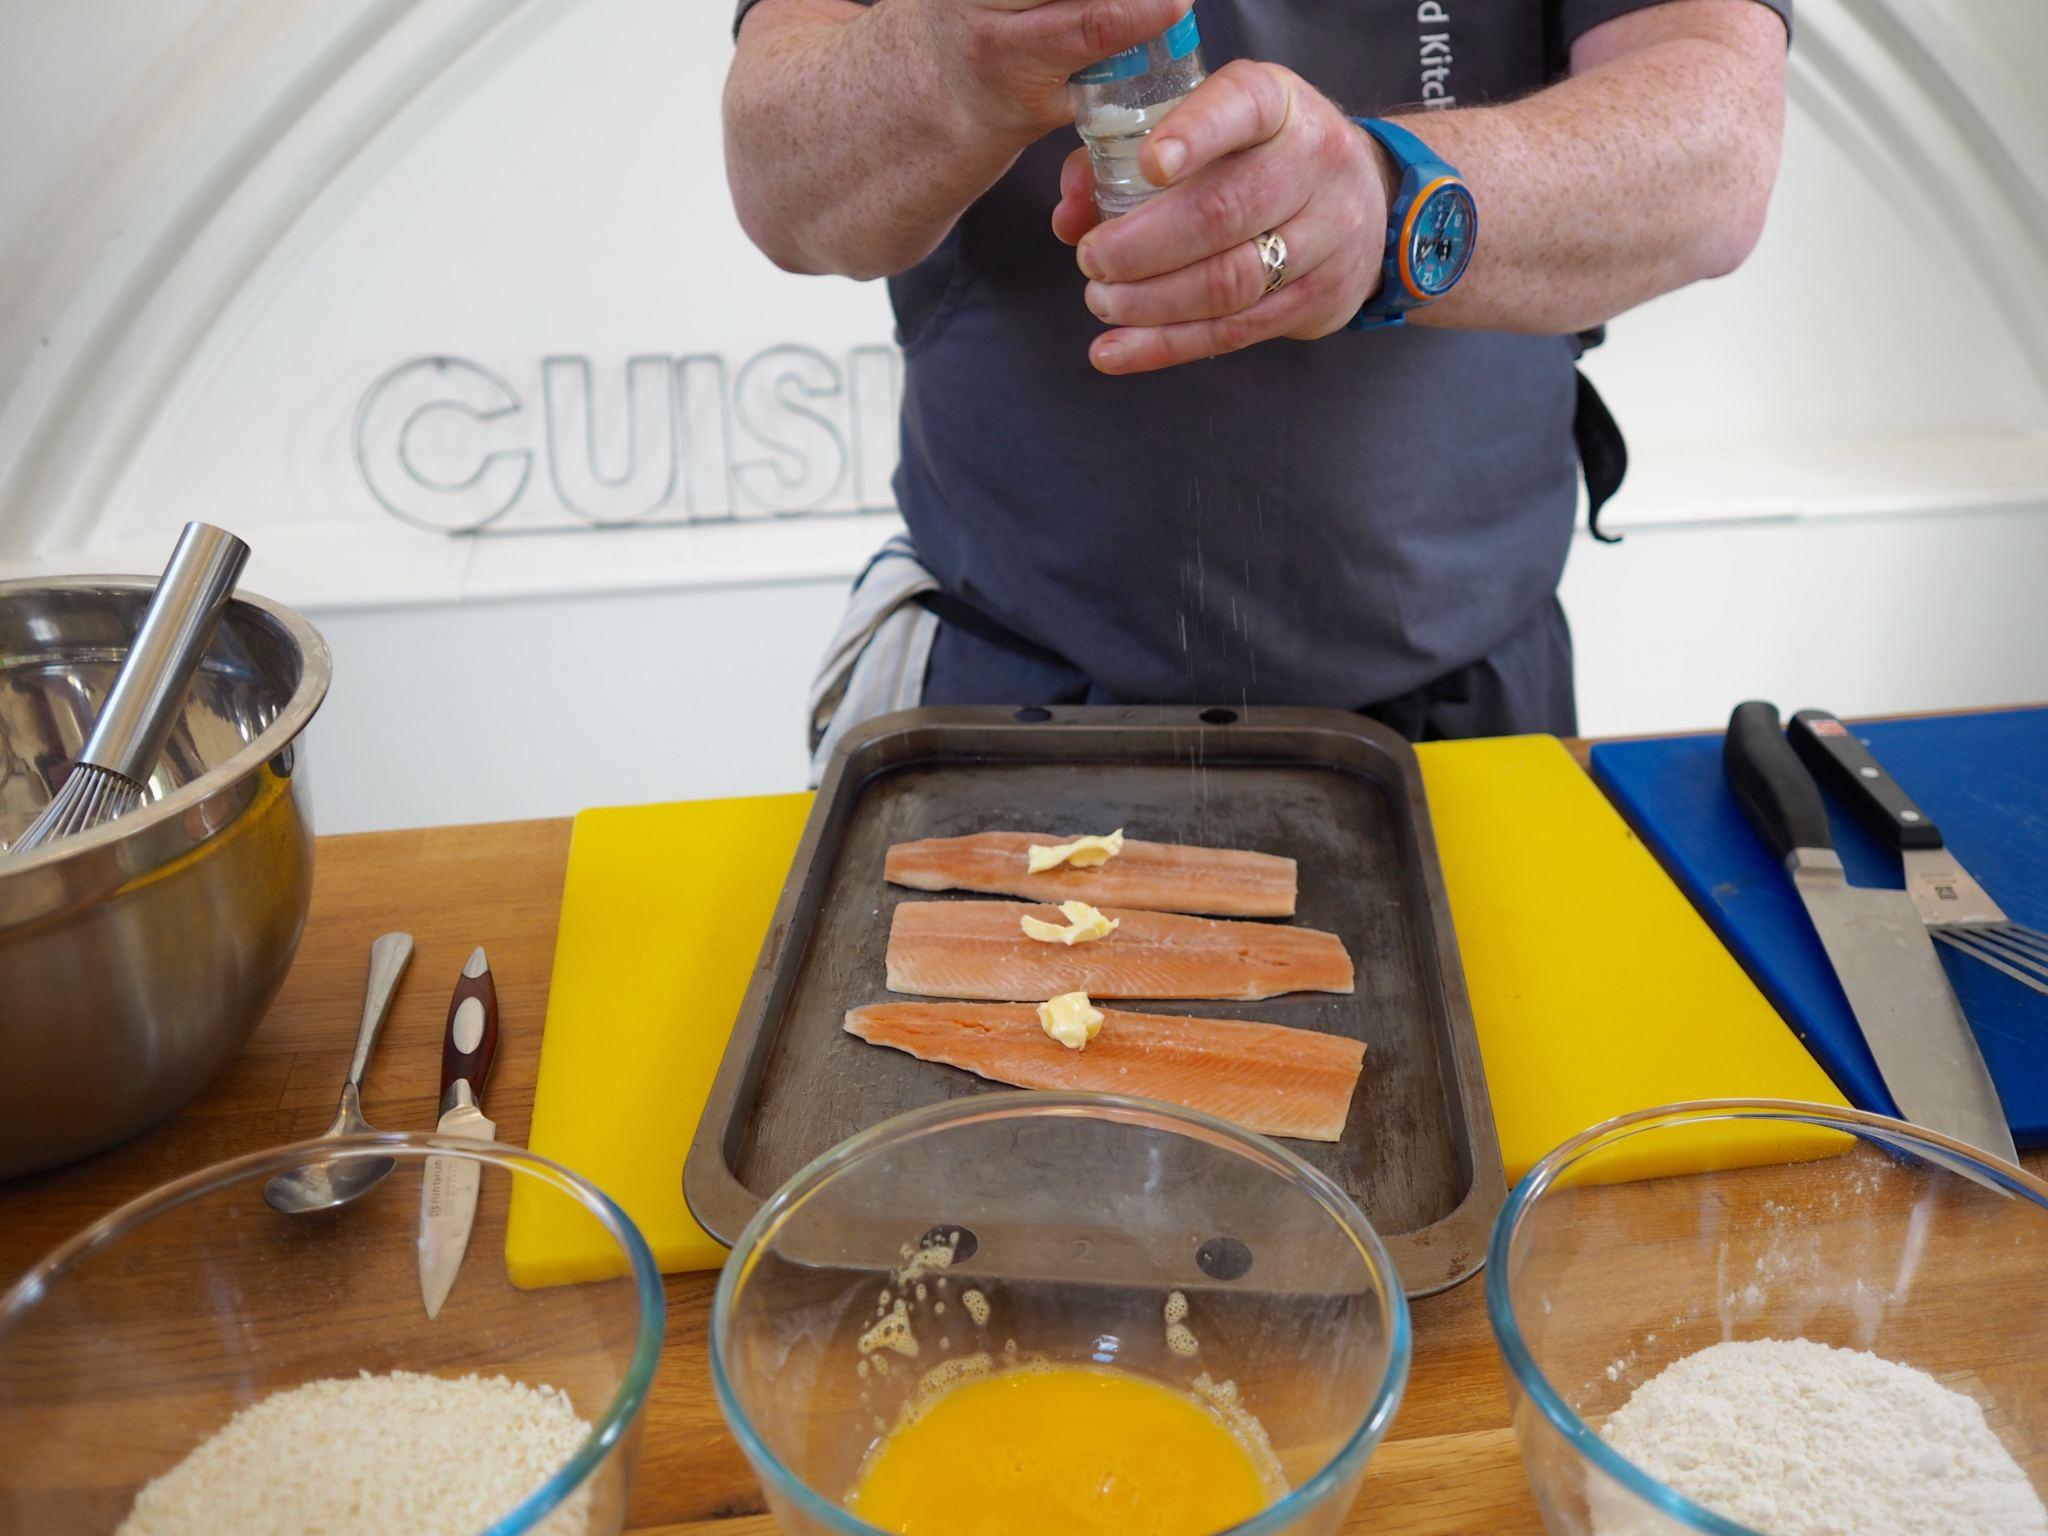 Chelsea Iceland School of fish cooking school neil nugent